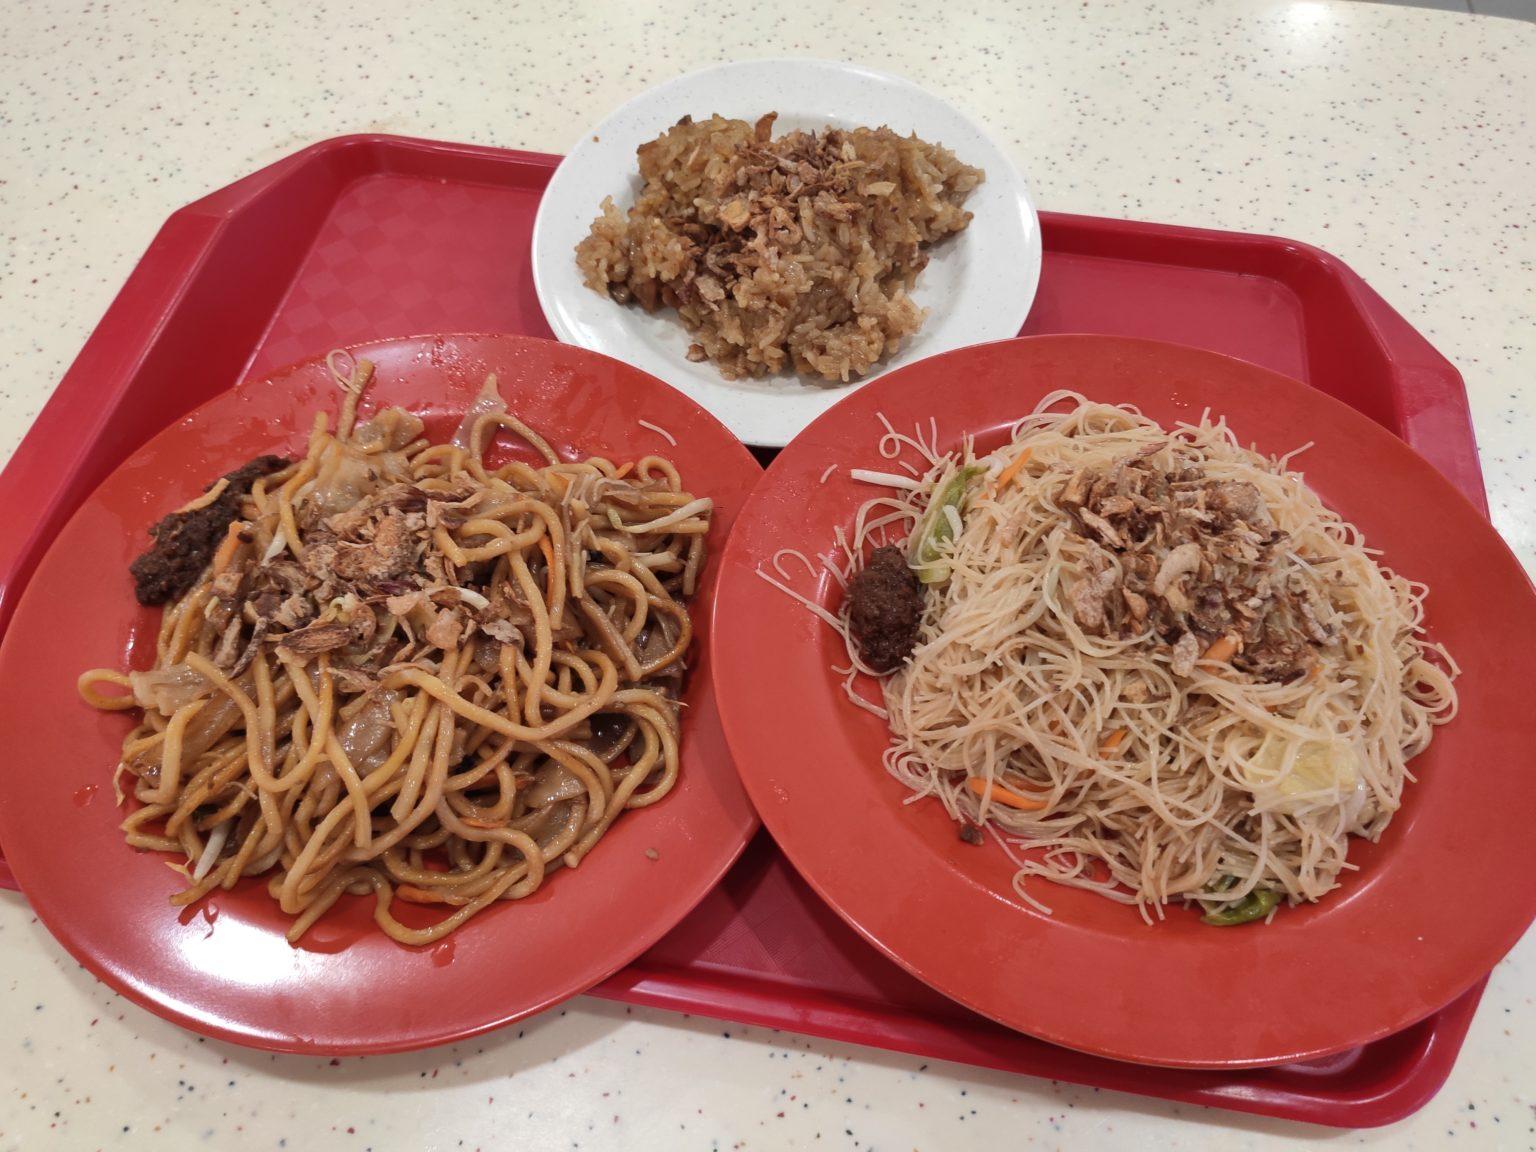 Review: Tian Cheng Food (Singapore)